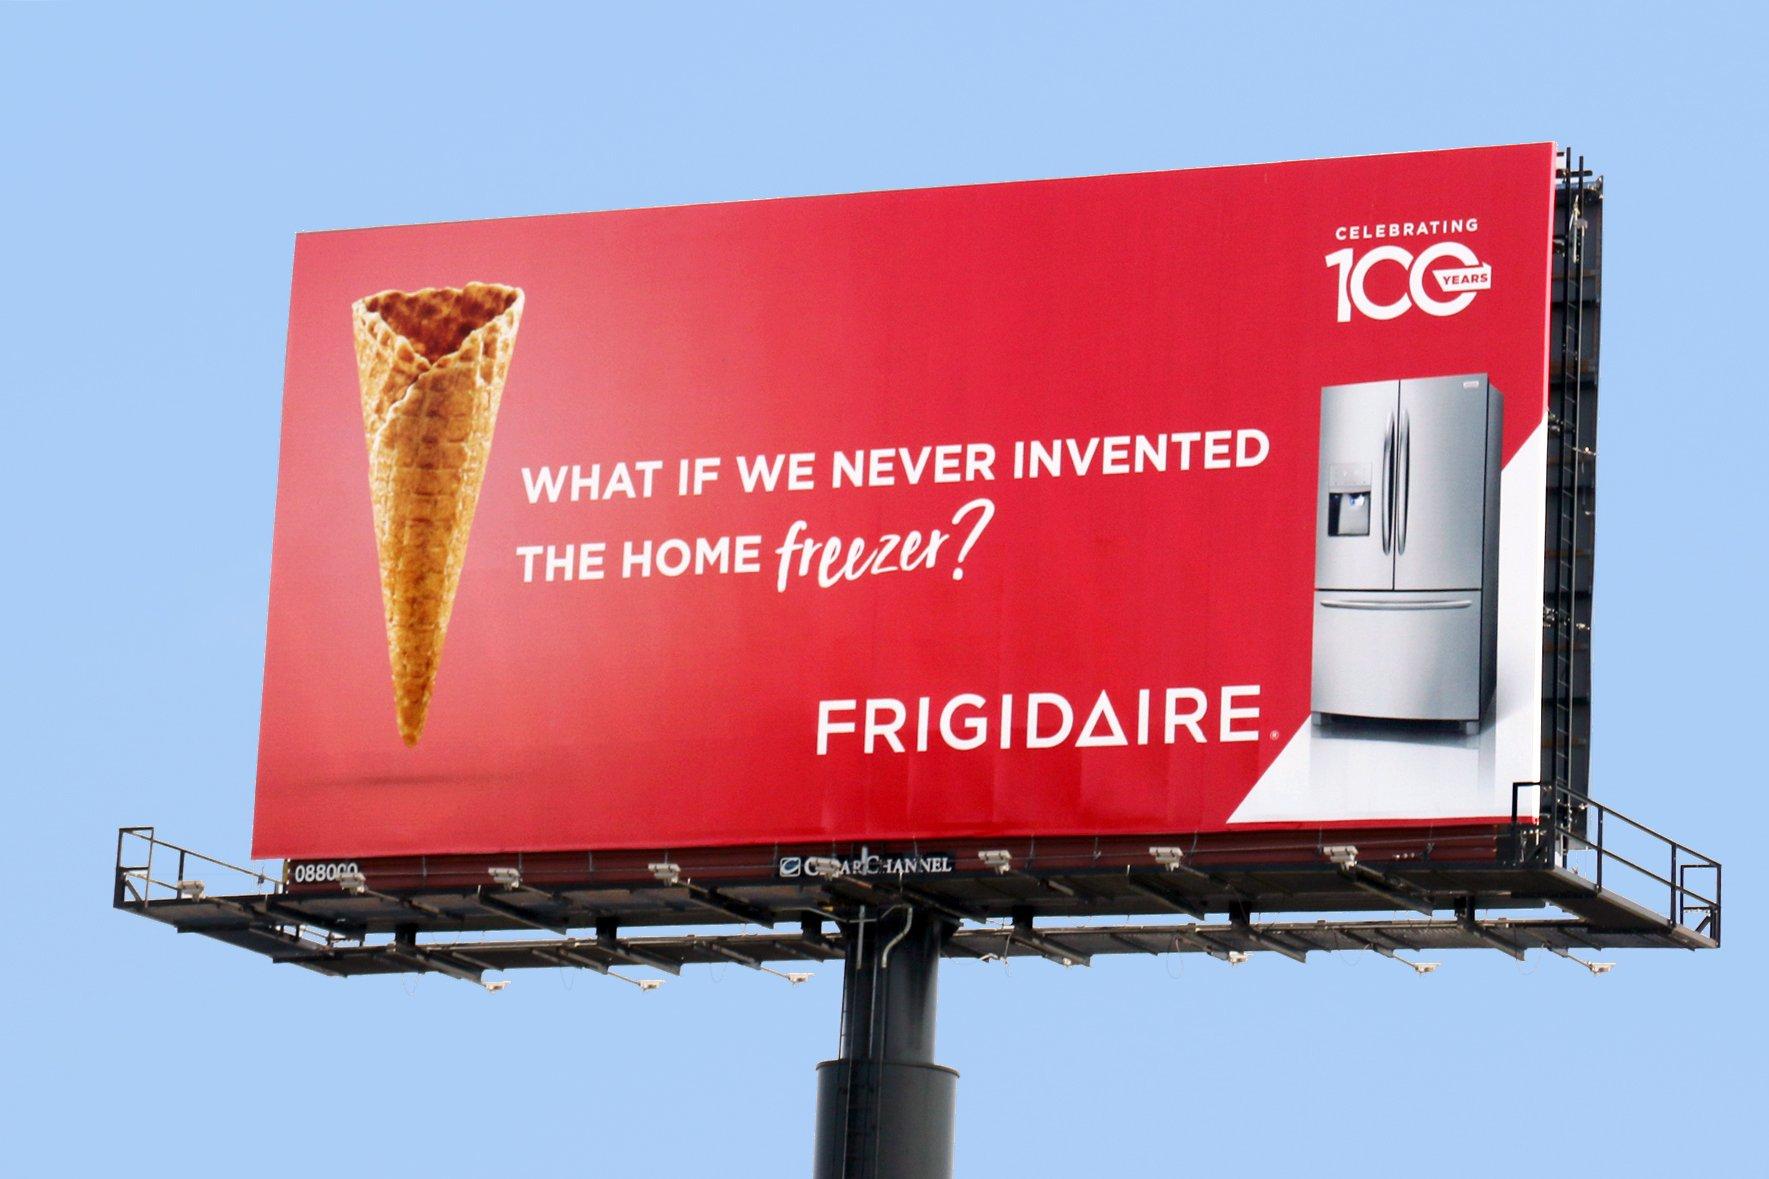 Frigidaire 100 Year Anniversary Billboard